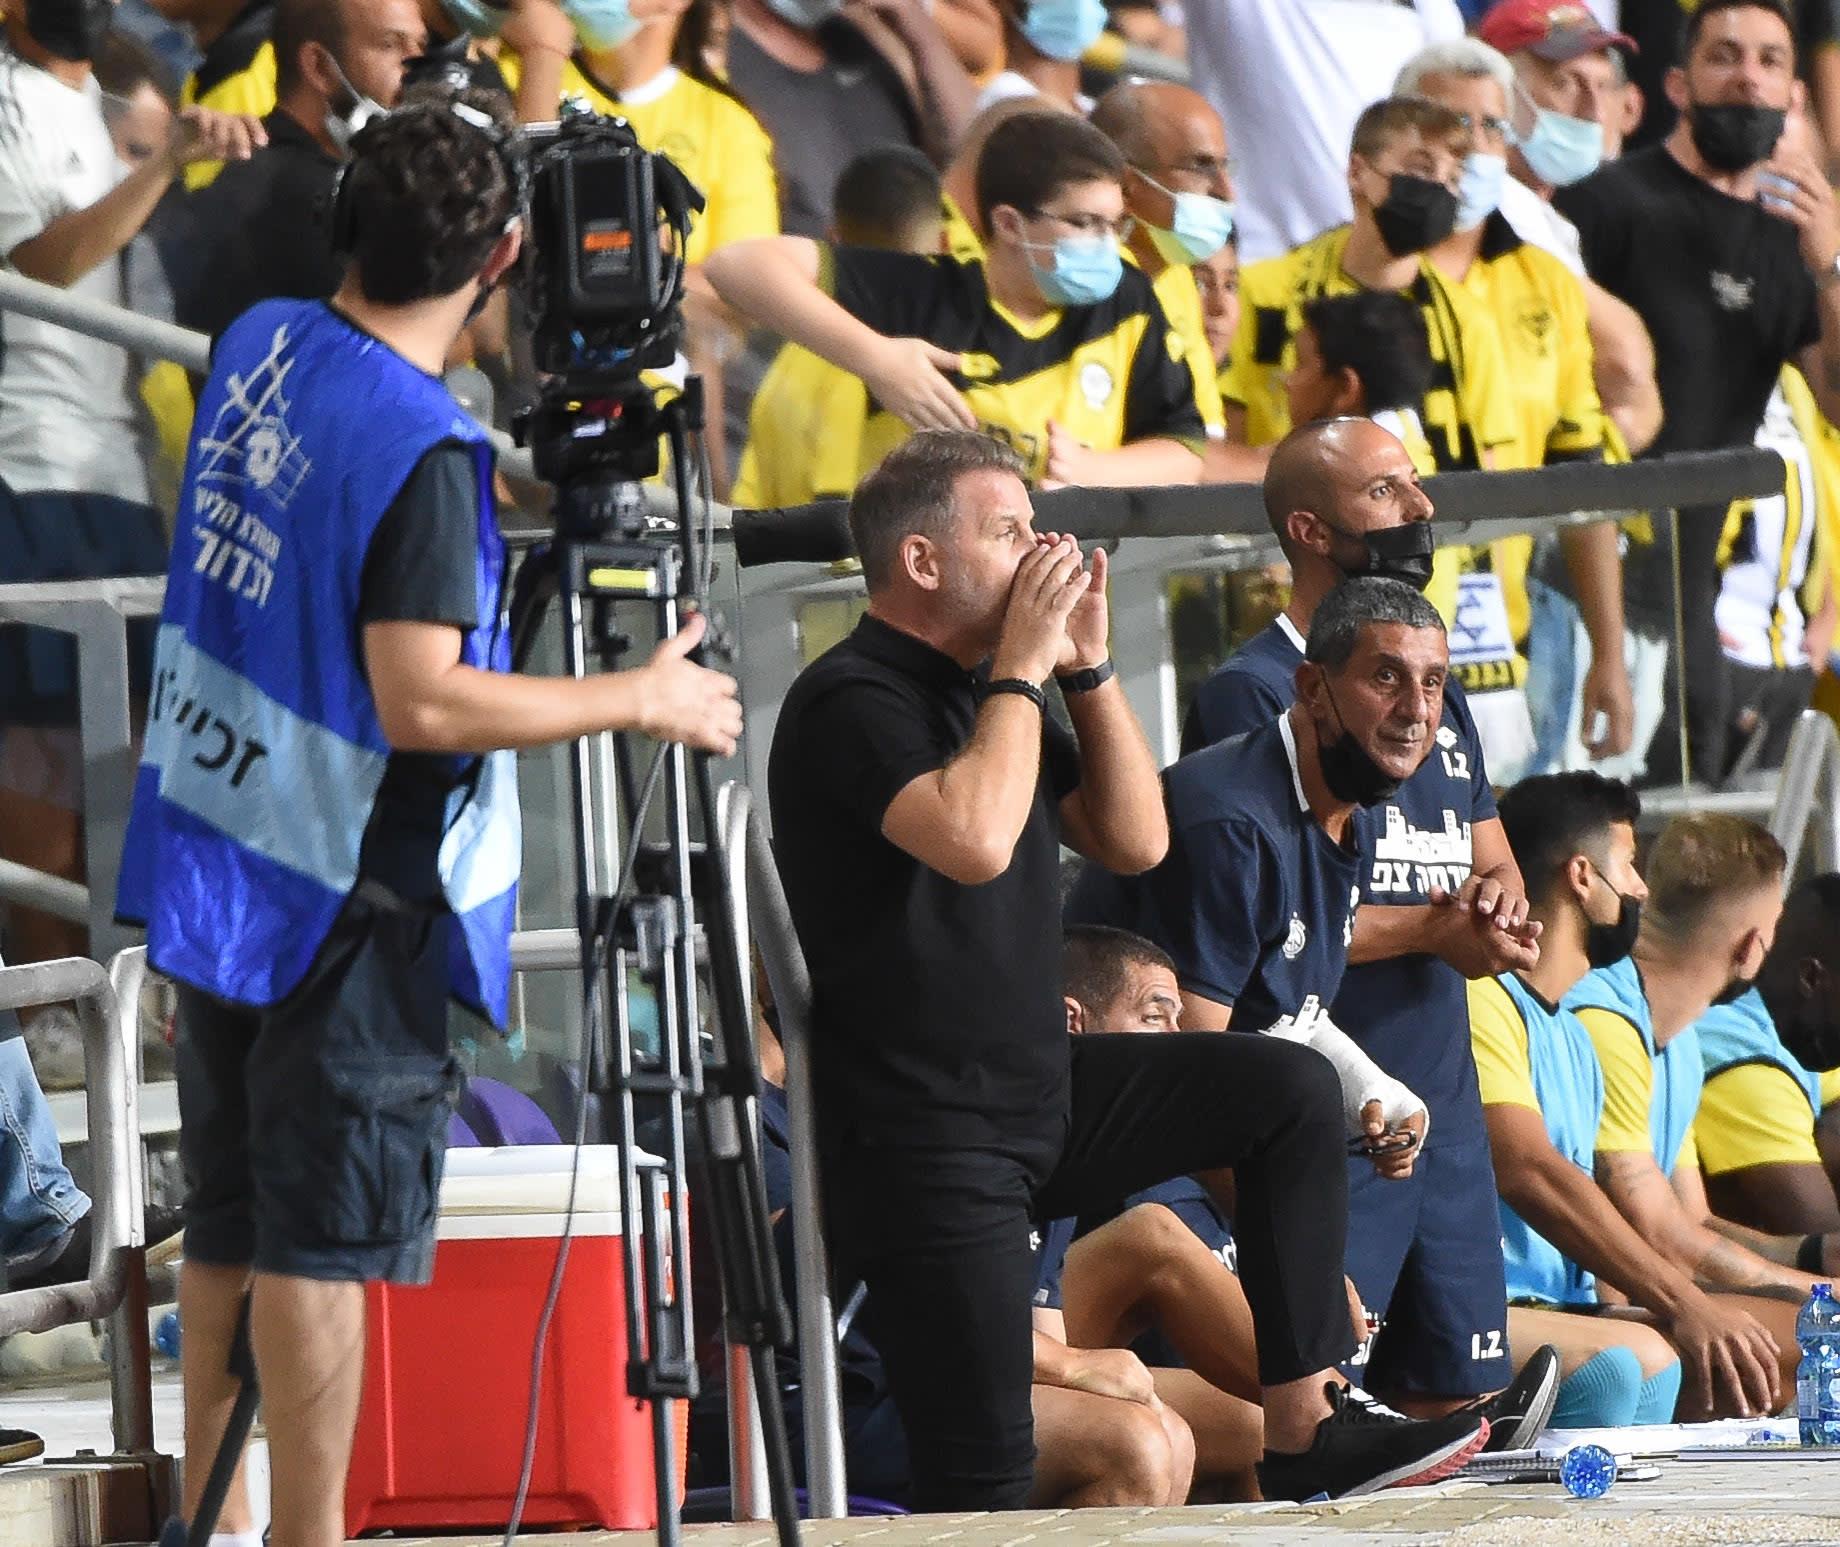 Raymond Atfeld, coach of Maccabi Netanya